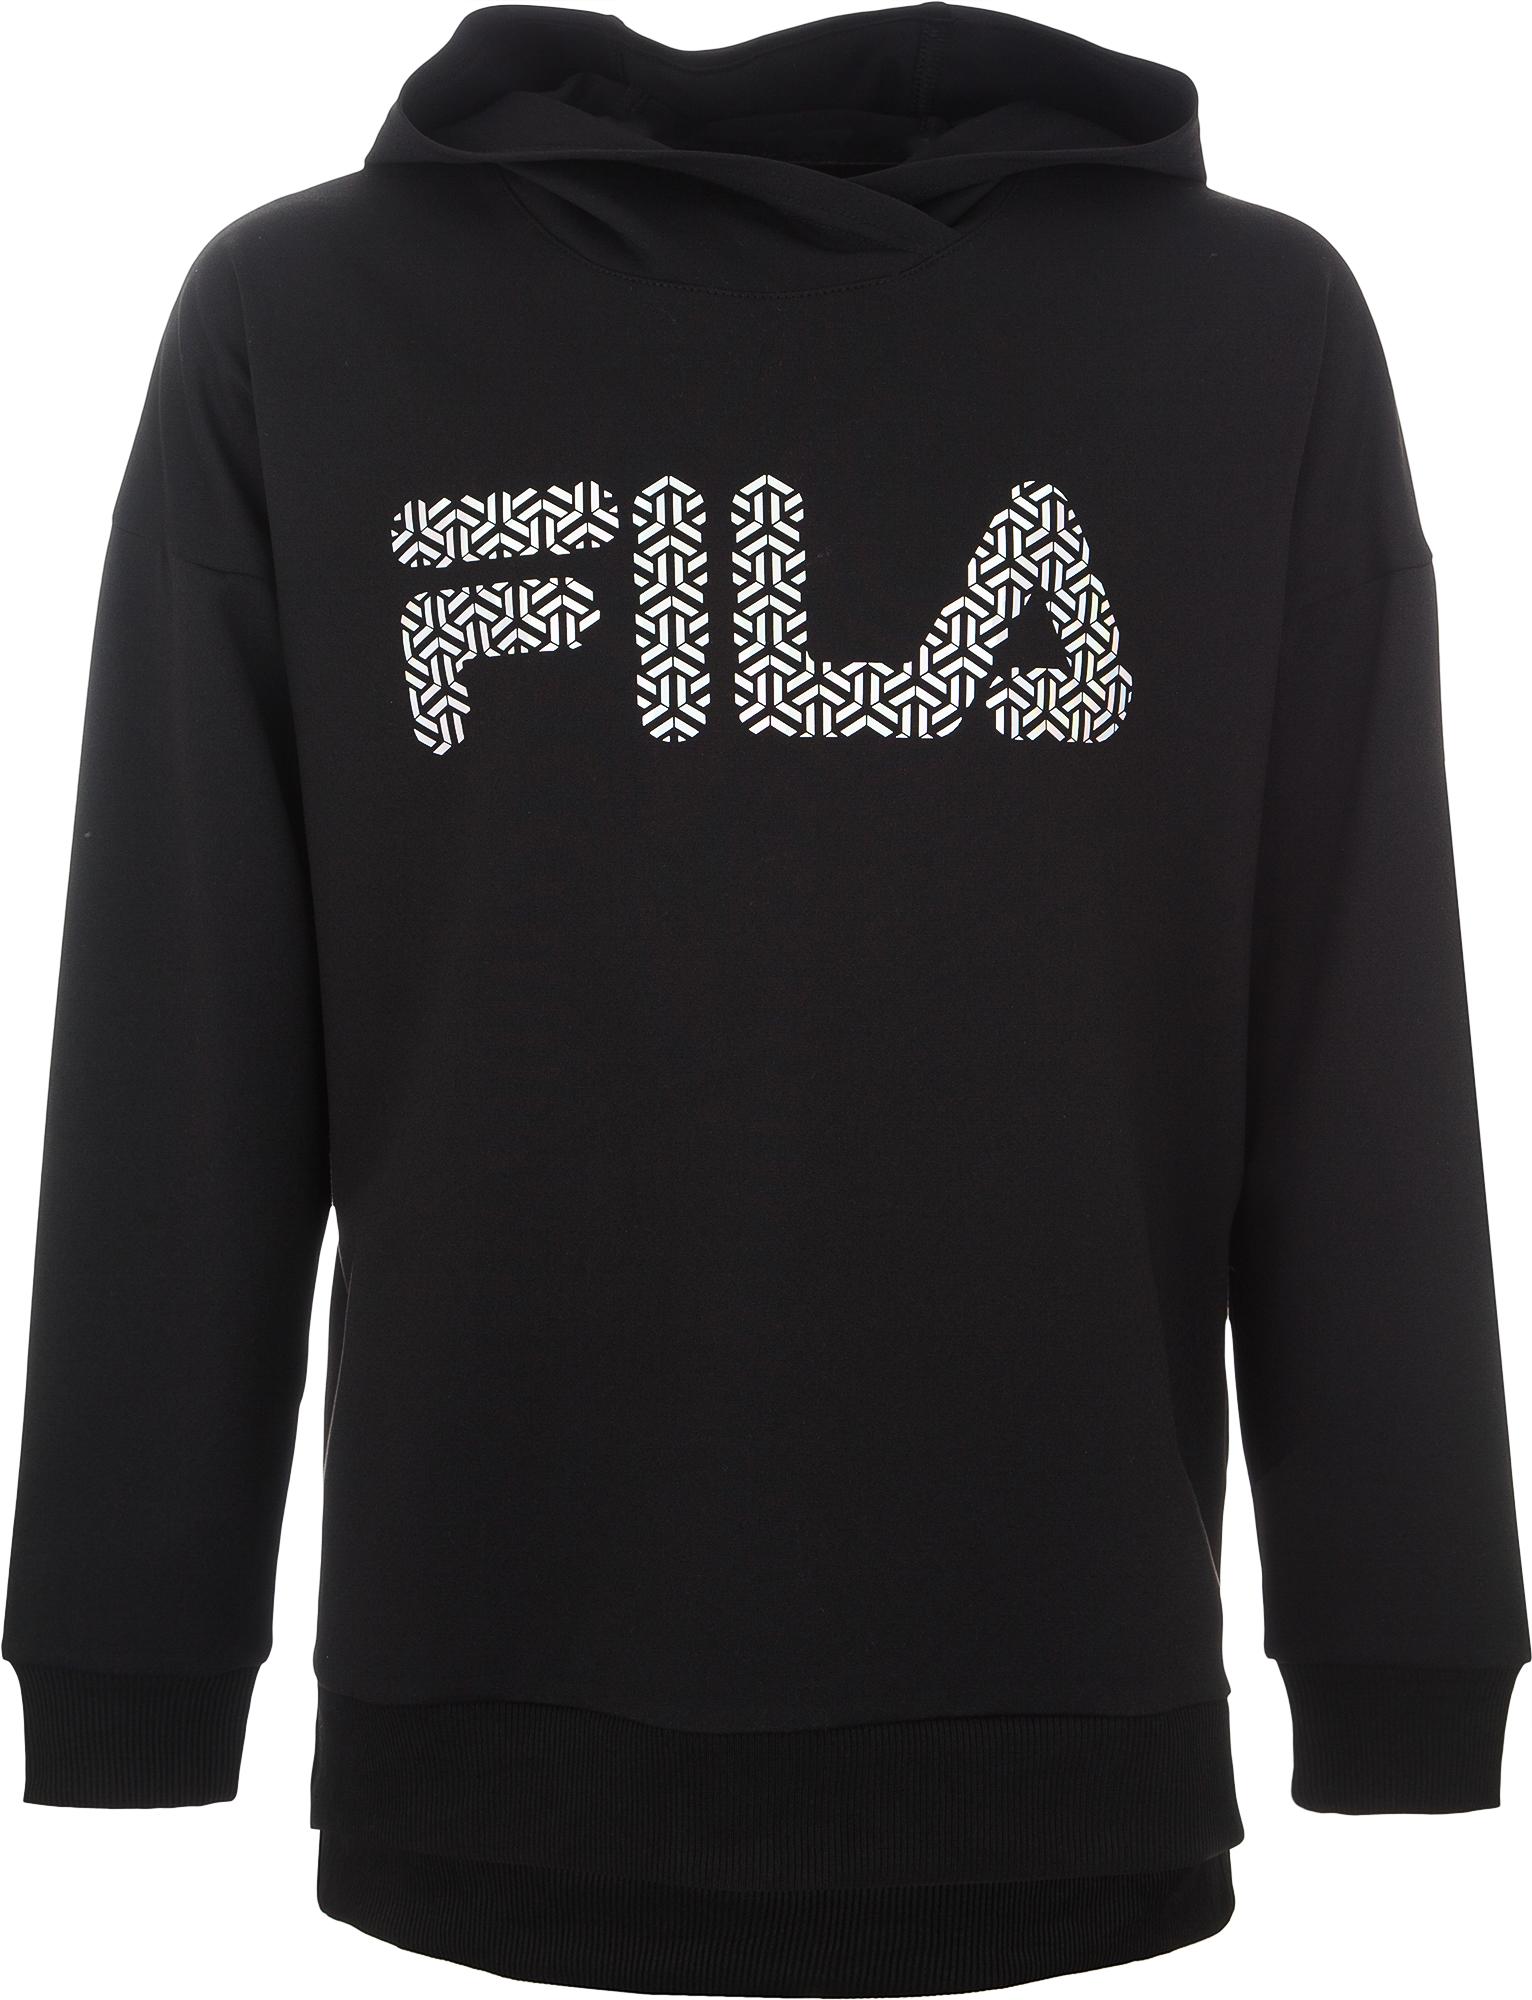 Fila Худи для девочек Fila, размер 128 цена и фото